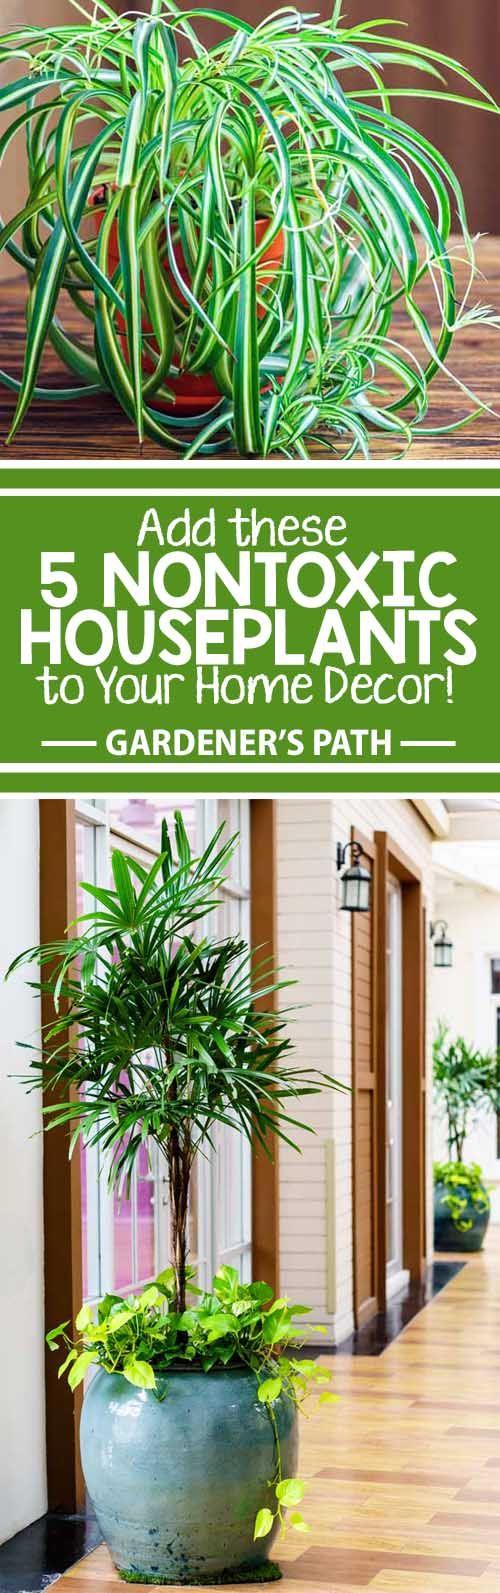 Best 20 pet safe ideas on pinterest diy printed art for Easy houseplants safe for pets